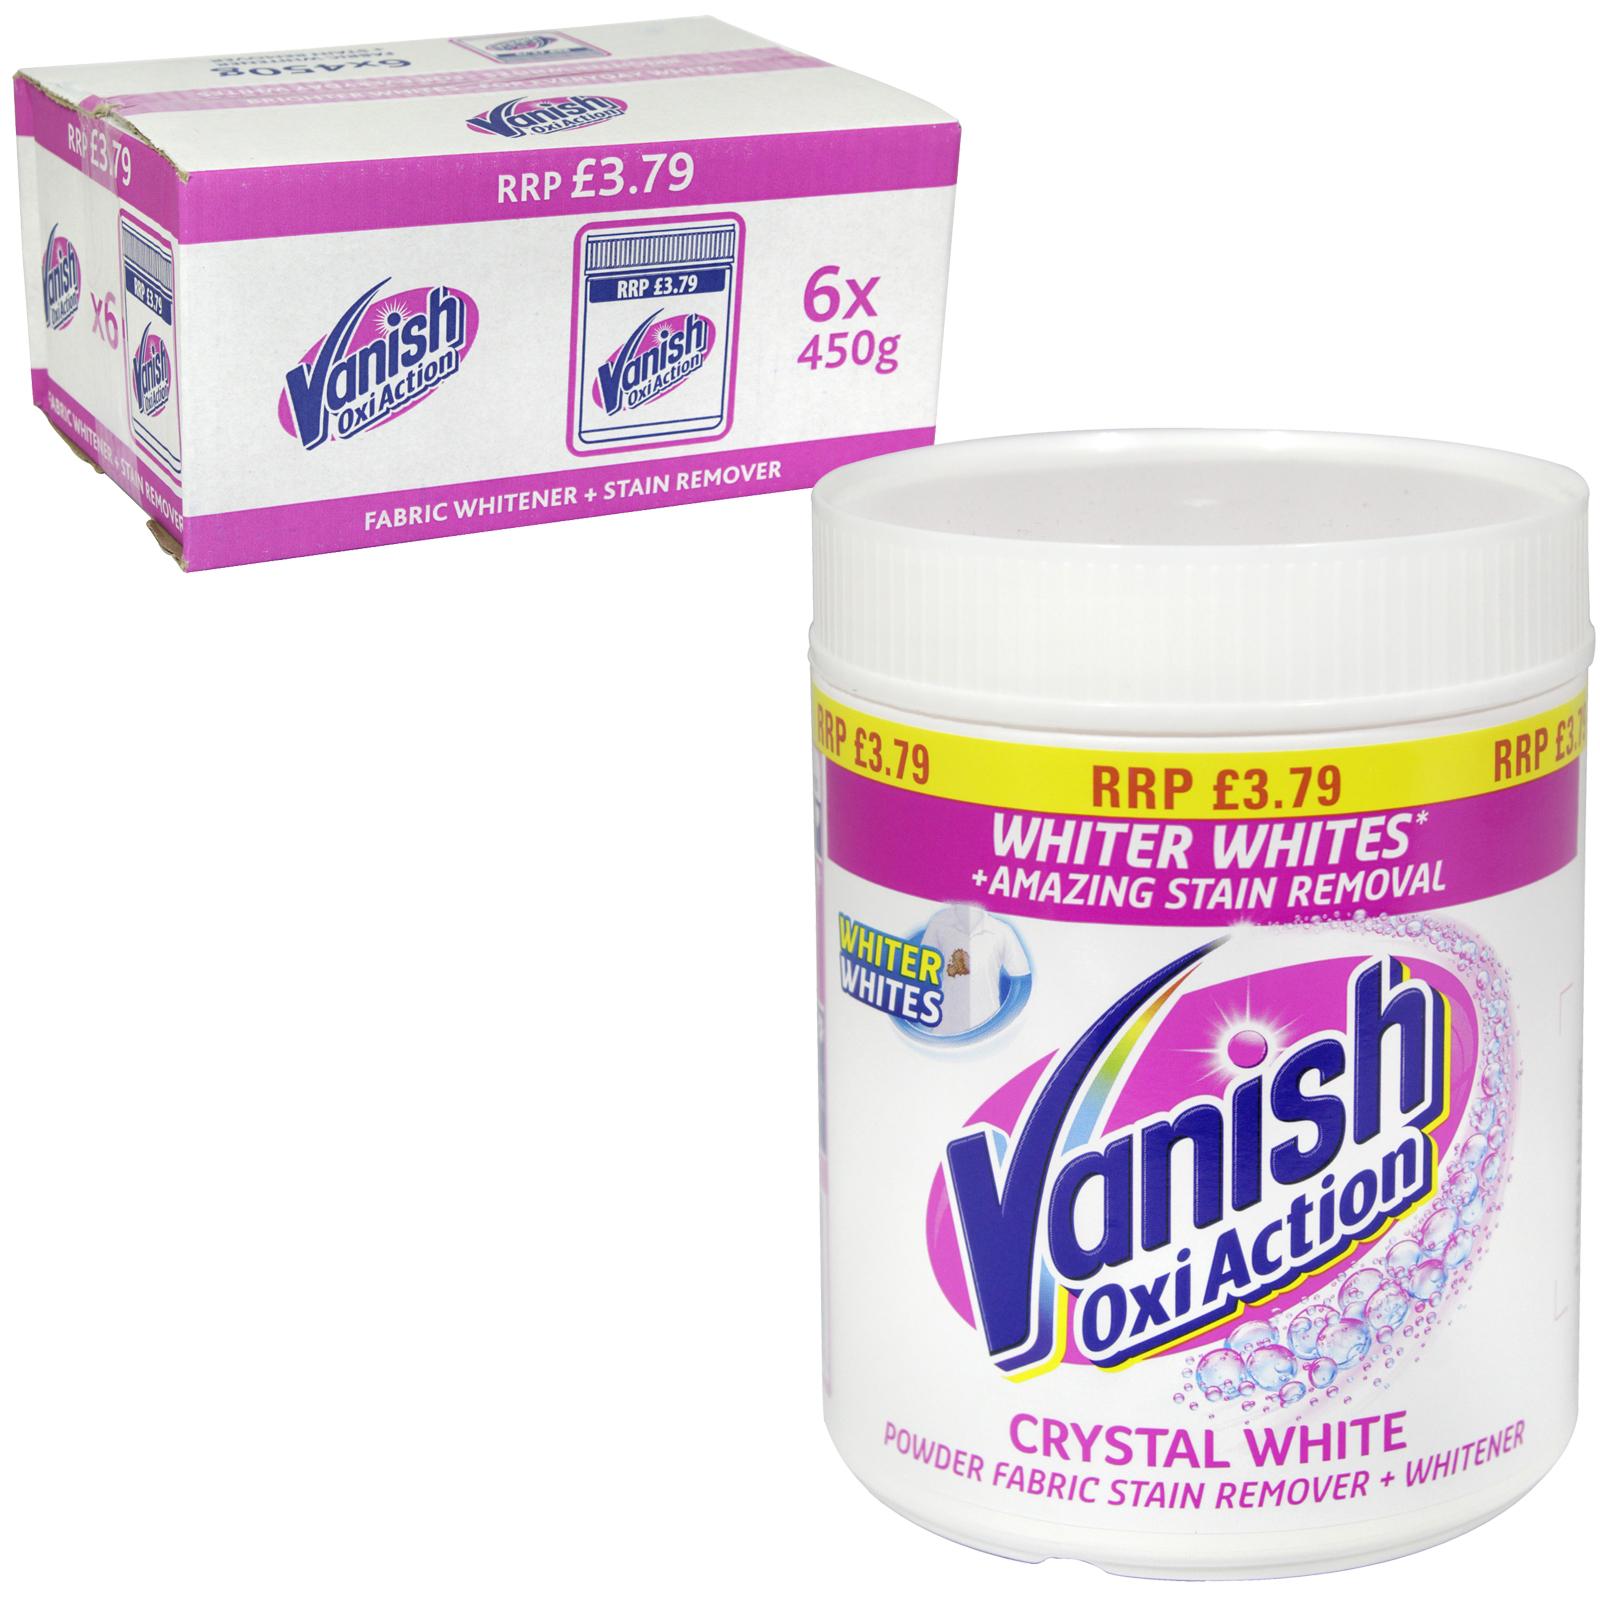 VANISH OXI-ACT POWDER 450G WHITES PM ?3.79  X6